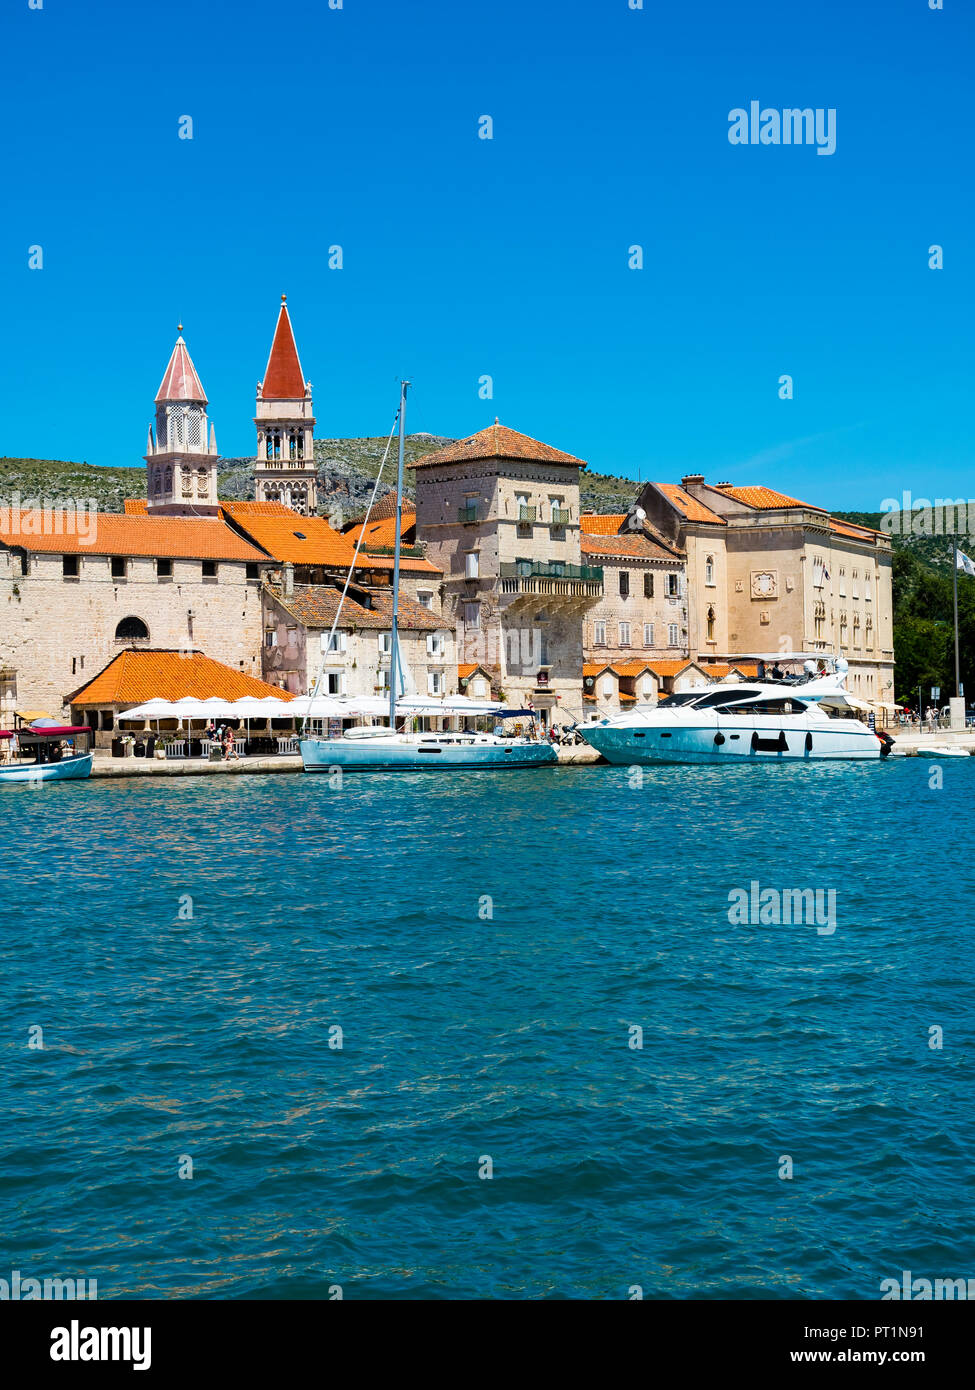 Kroatien, Adriaküste, Dalmatien, Region Split, Altstadt Trogir, UNESCO Weltkulturerbe,Kathedrale Sveti Lovro oder St.-Laurentius-Kathedrale,,Riva Prom - Stock Image